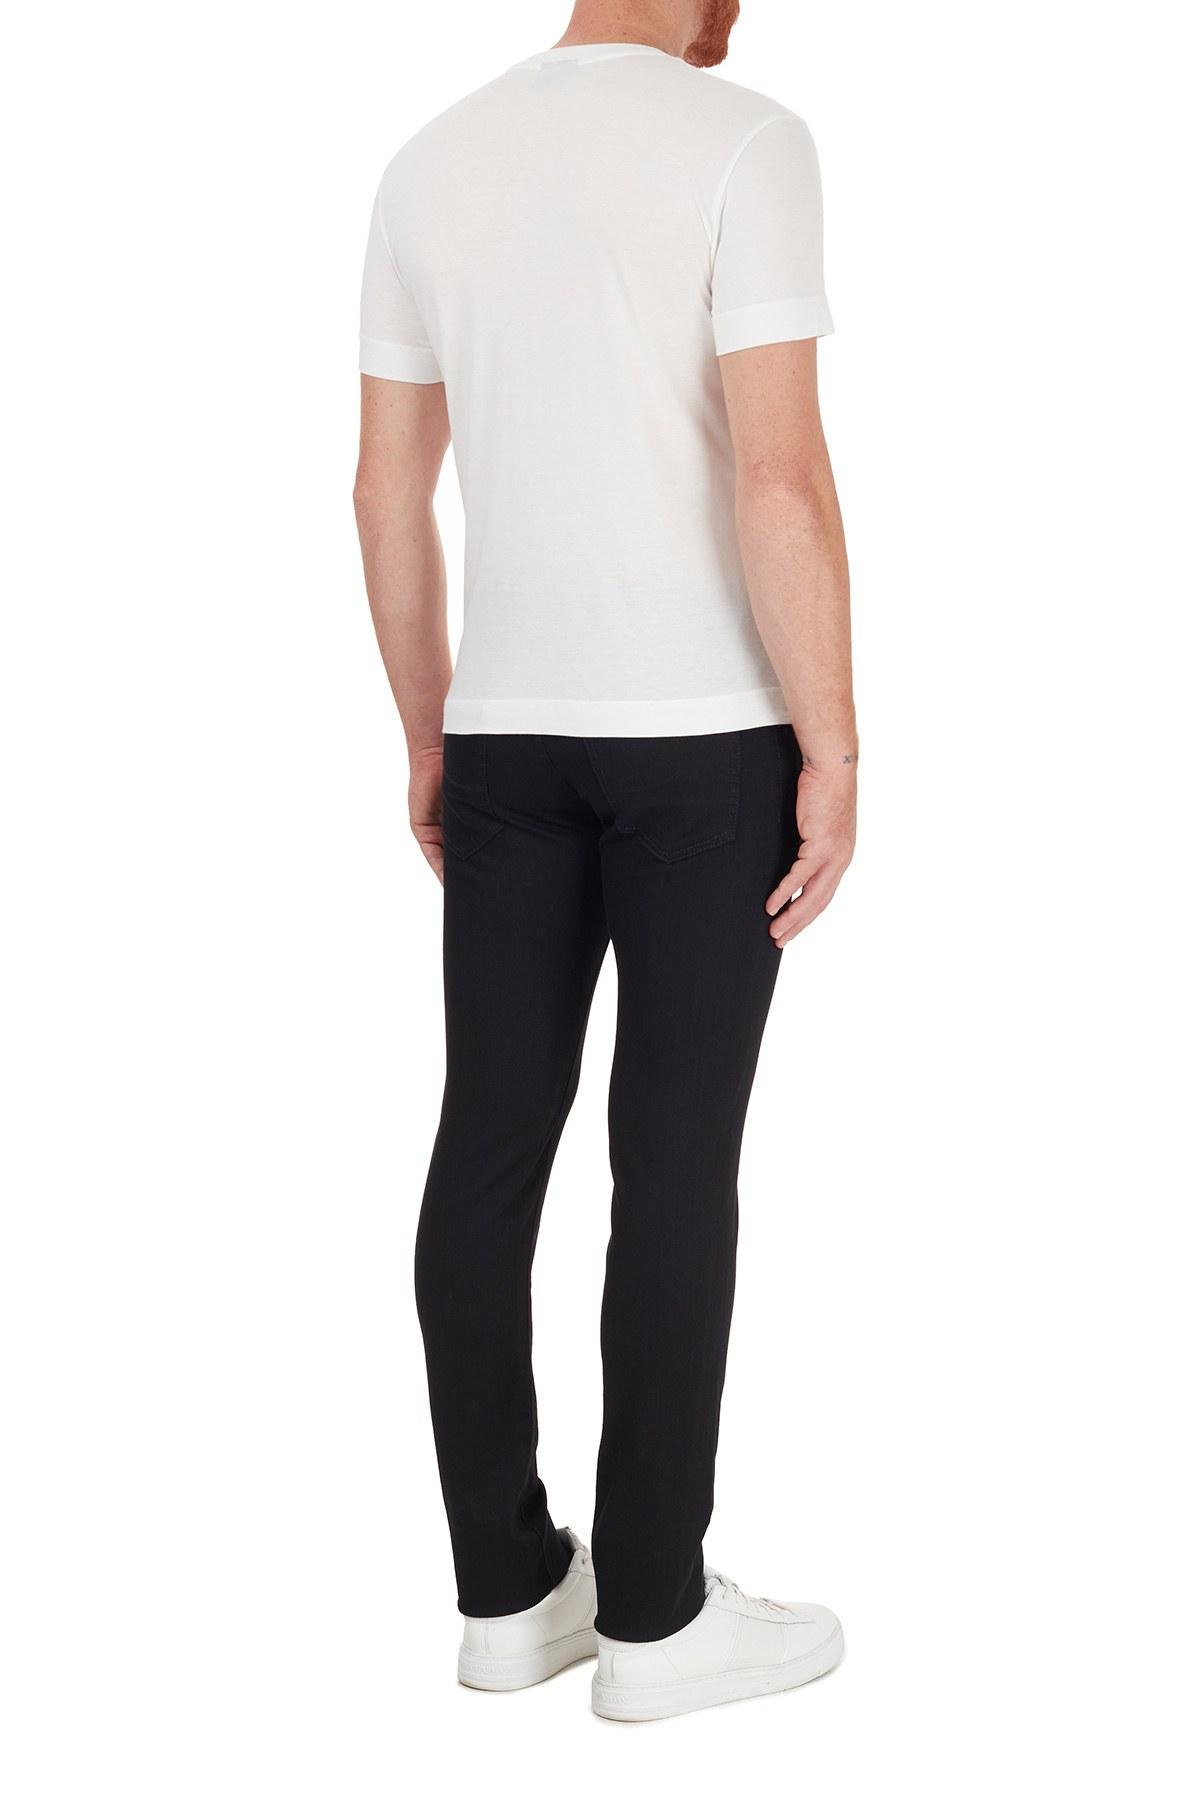 Jacob Cohen Slim Fit Pamuklu Jeans Erkek Kot Pantolon J622 SLIM 01789W1 SİYAH